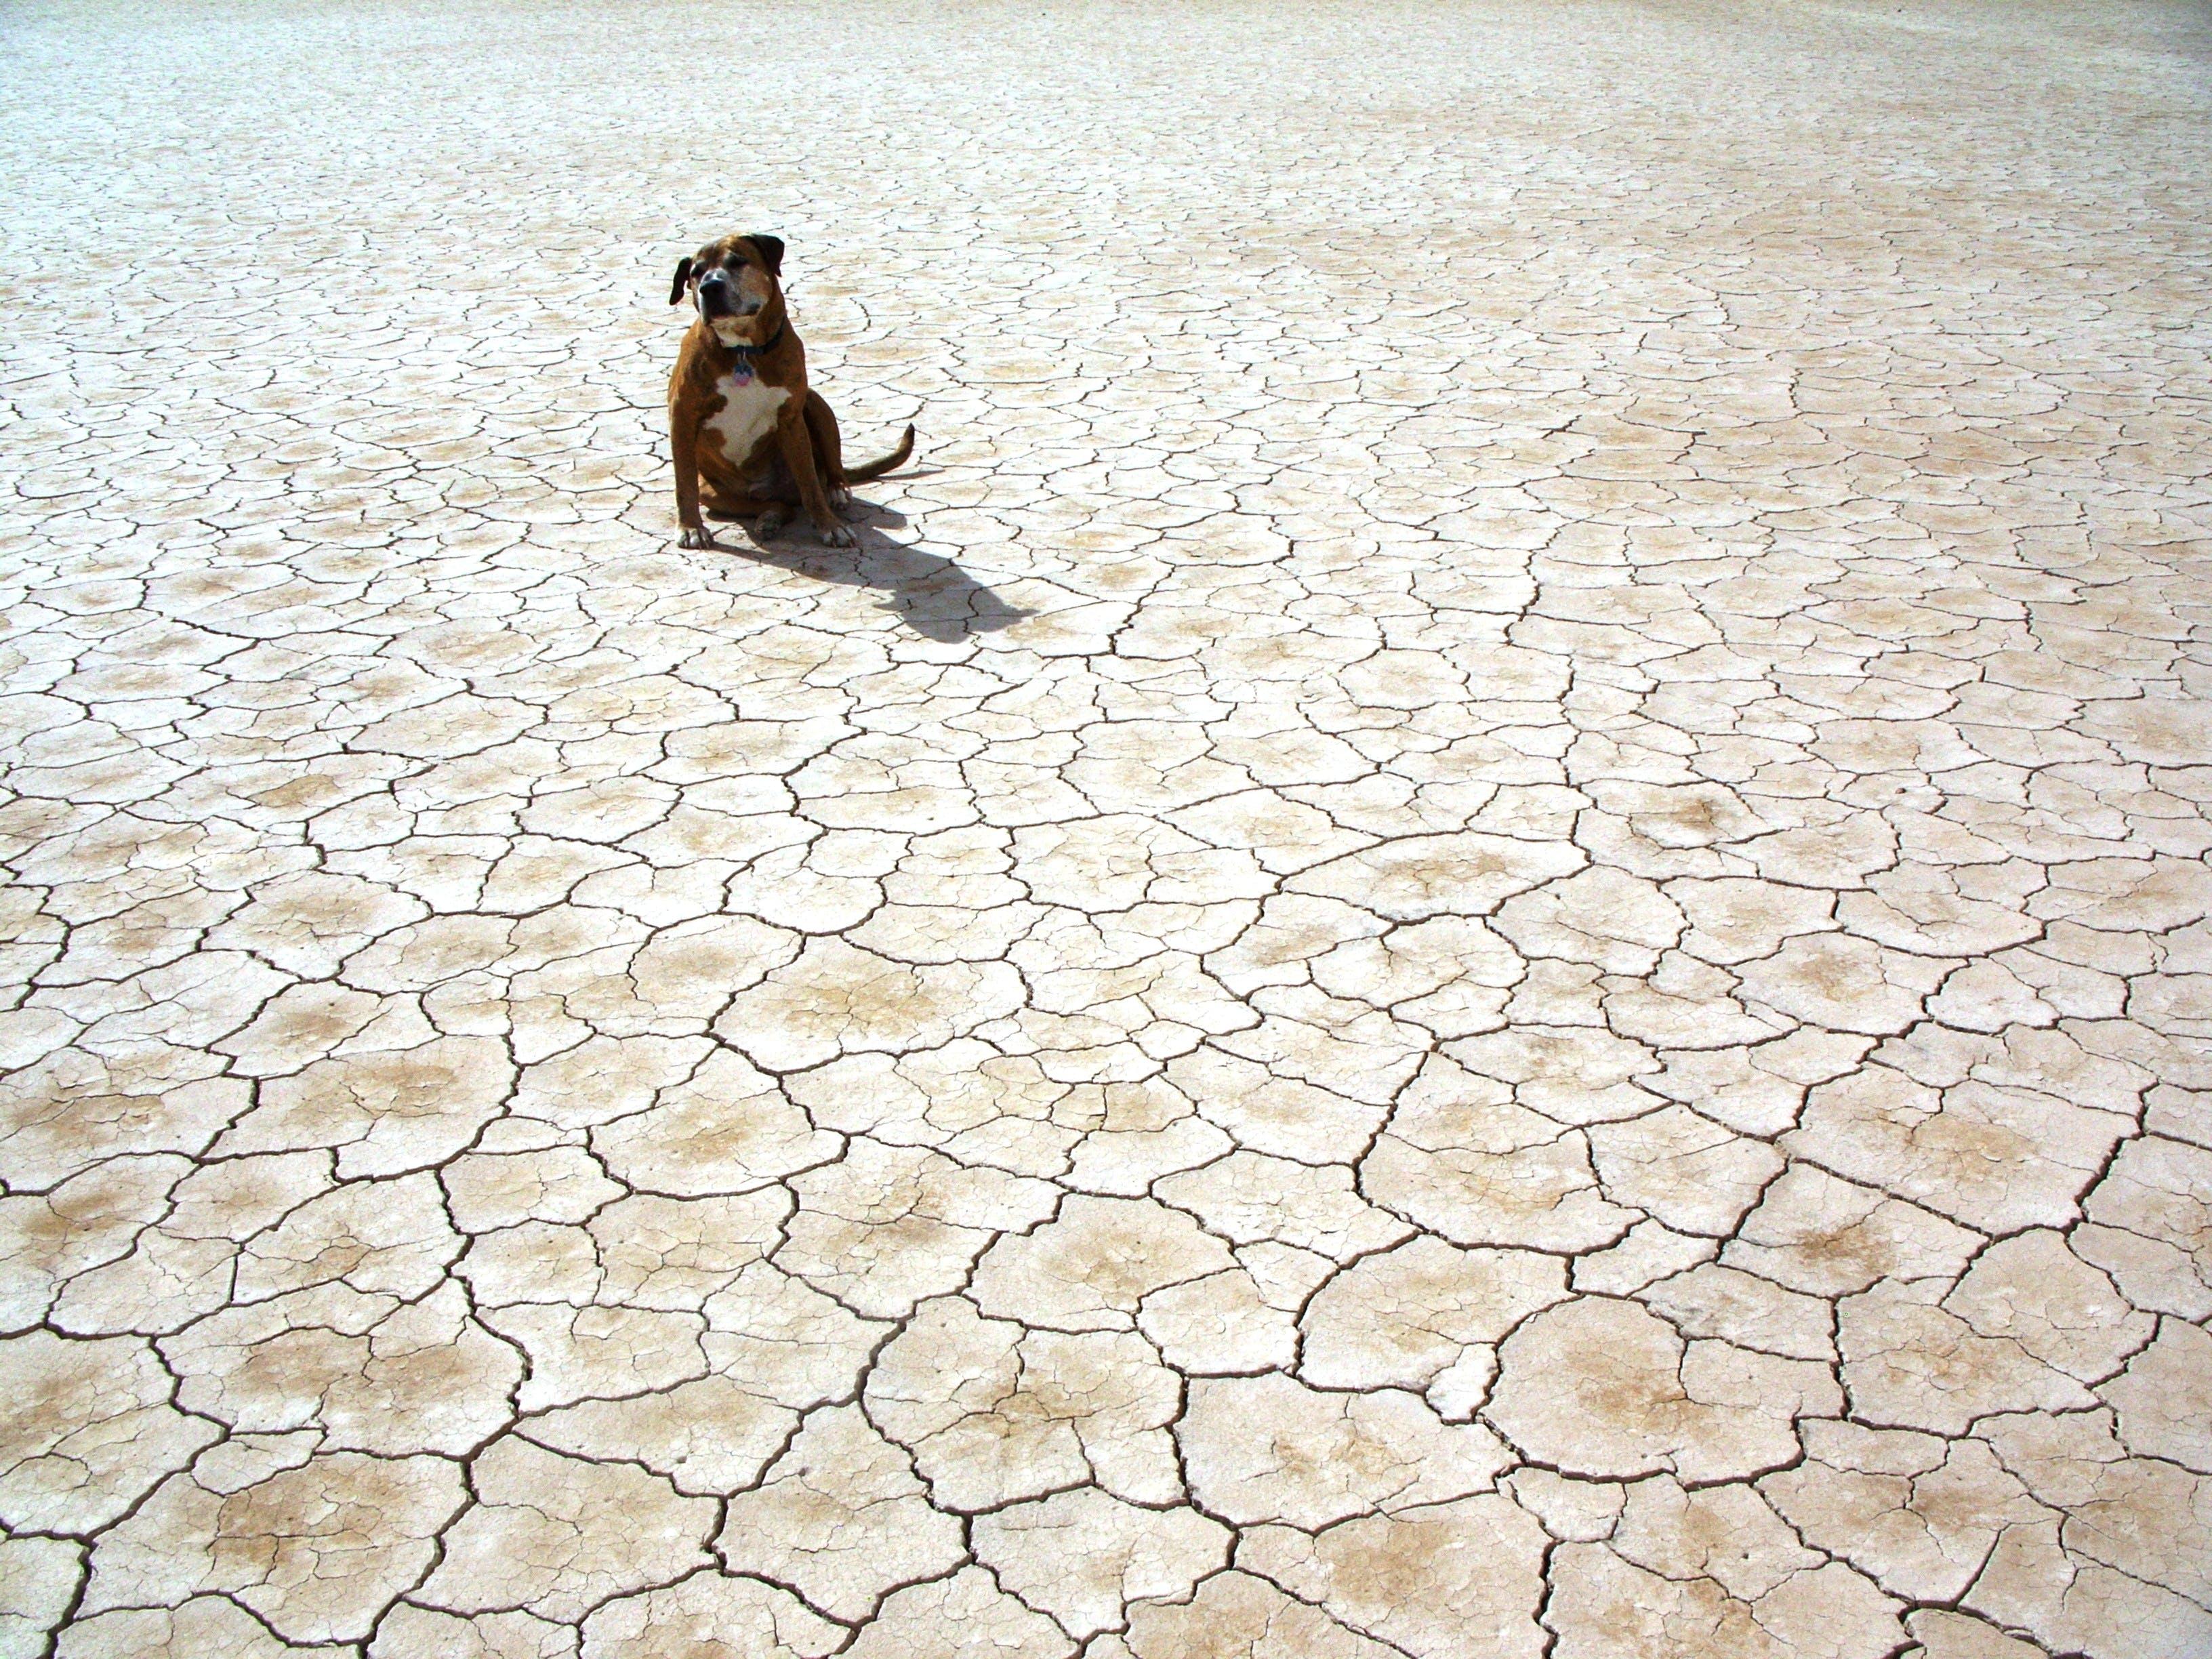 Photography of Dog Sitting on Ground